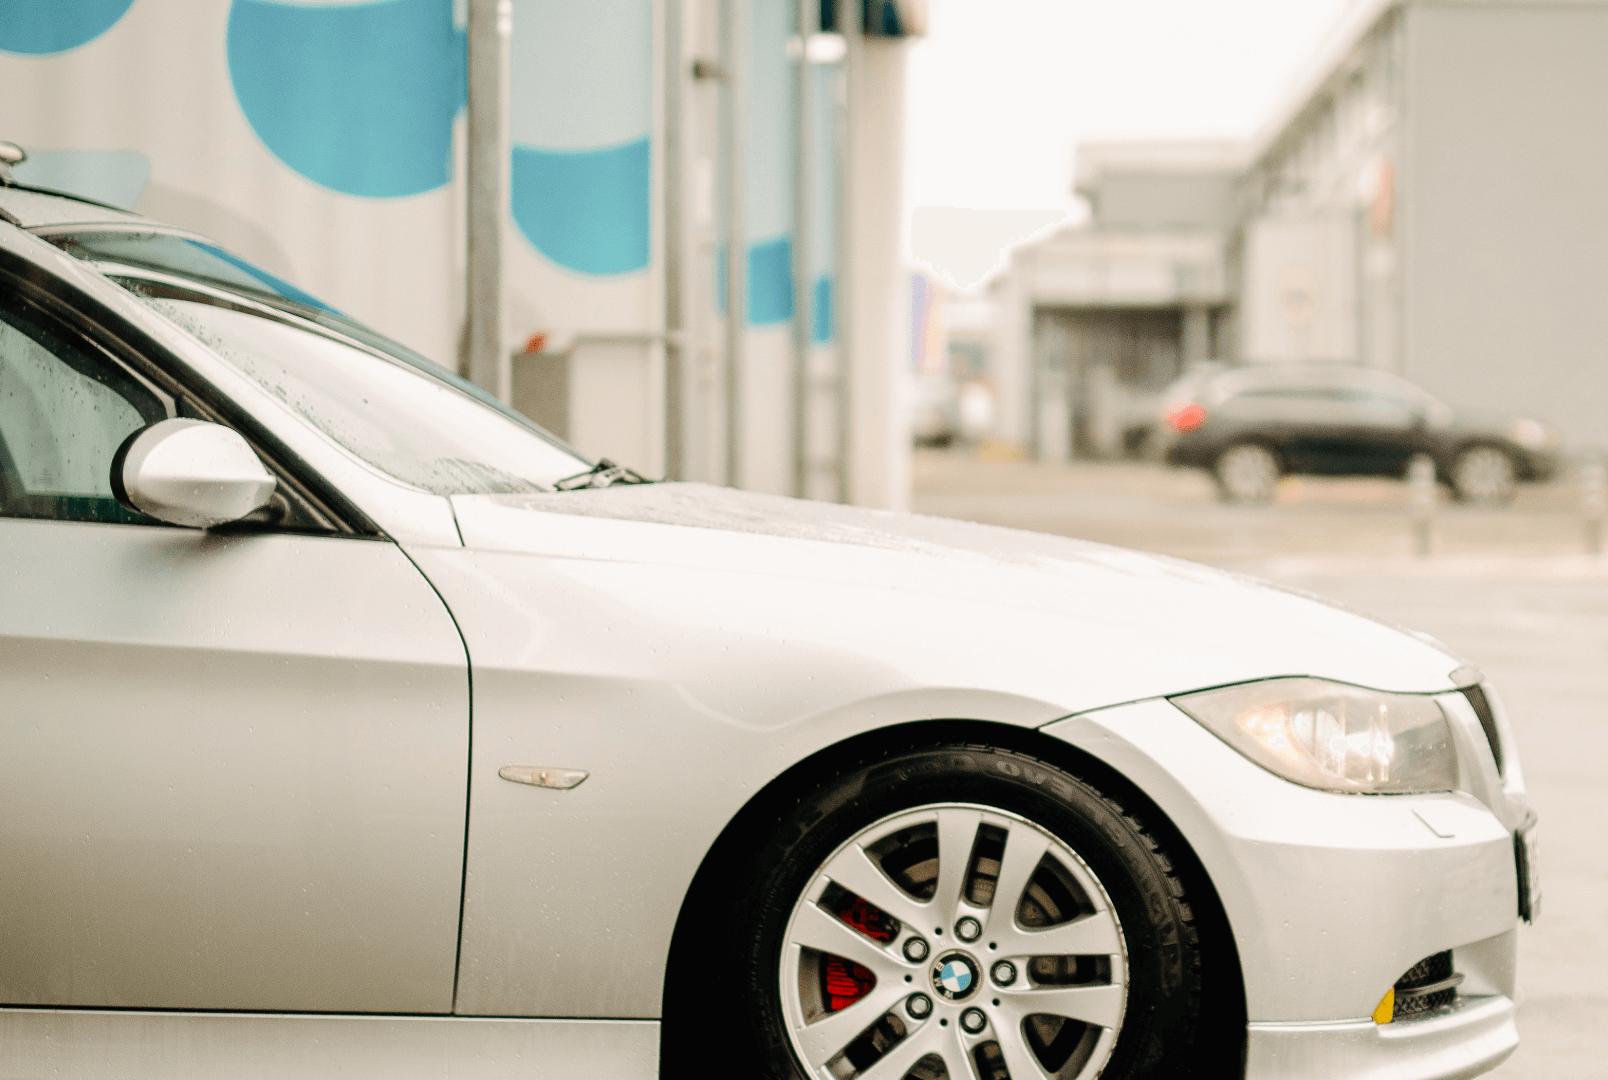 automobilis-plovykloje